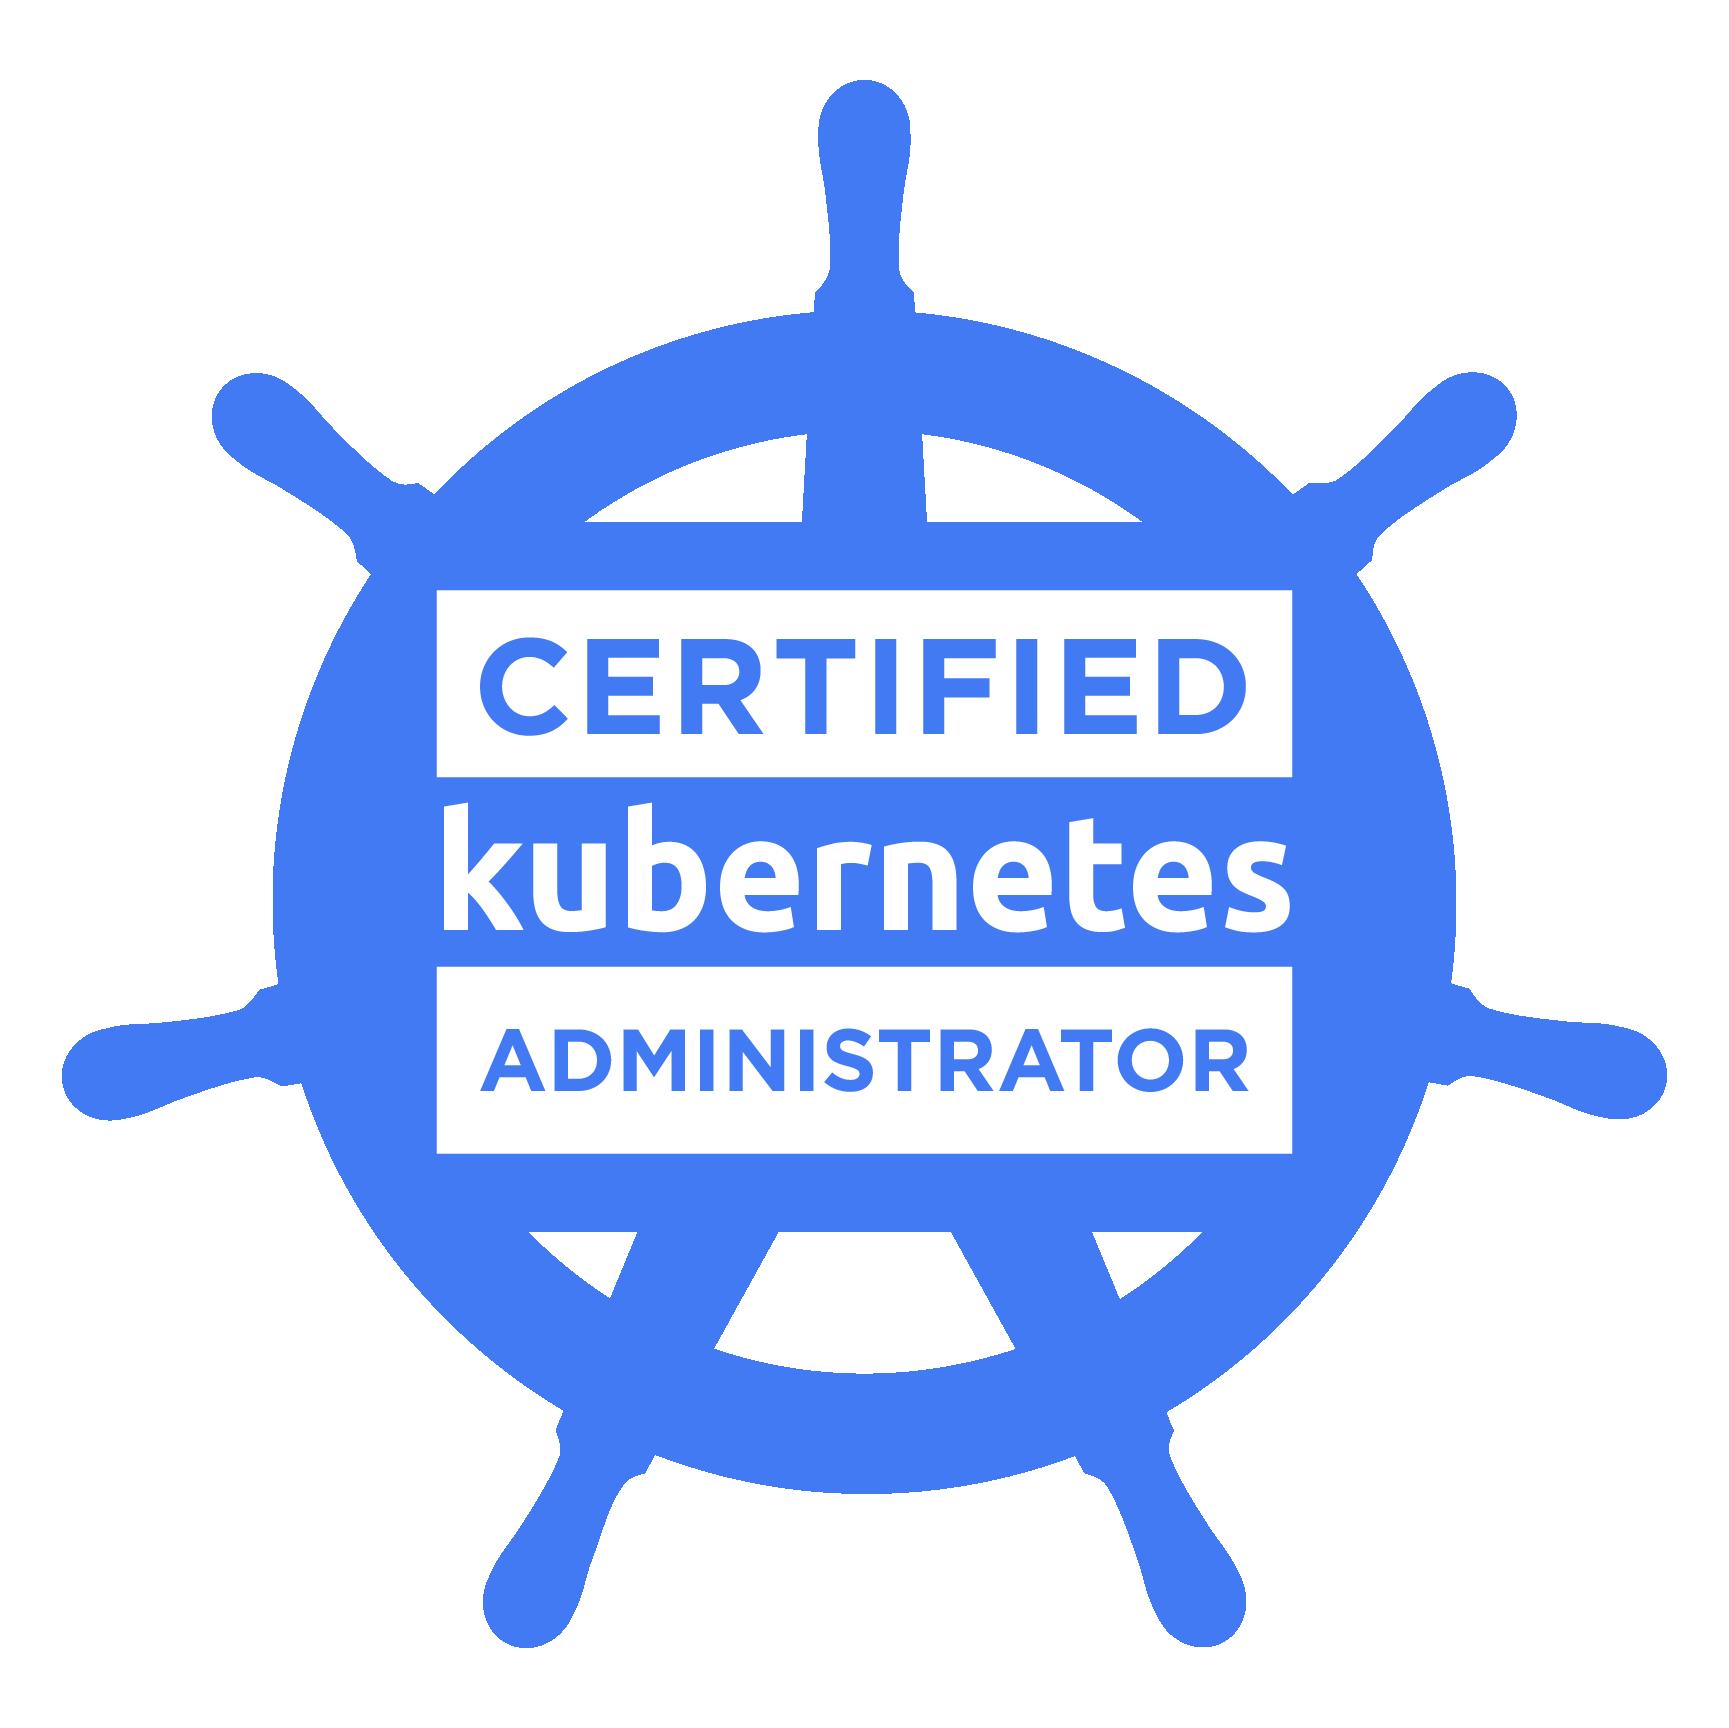 Certified Kubernetes Administrators